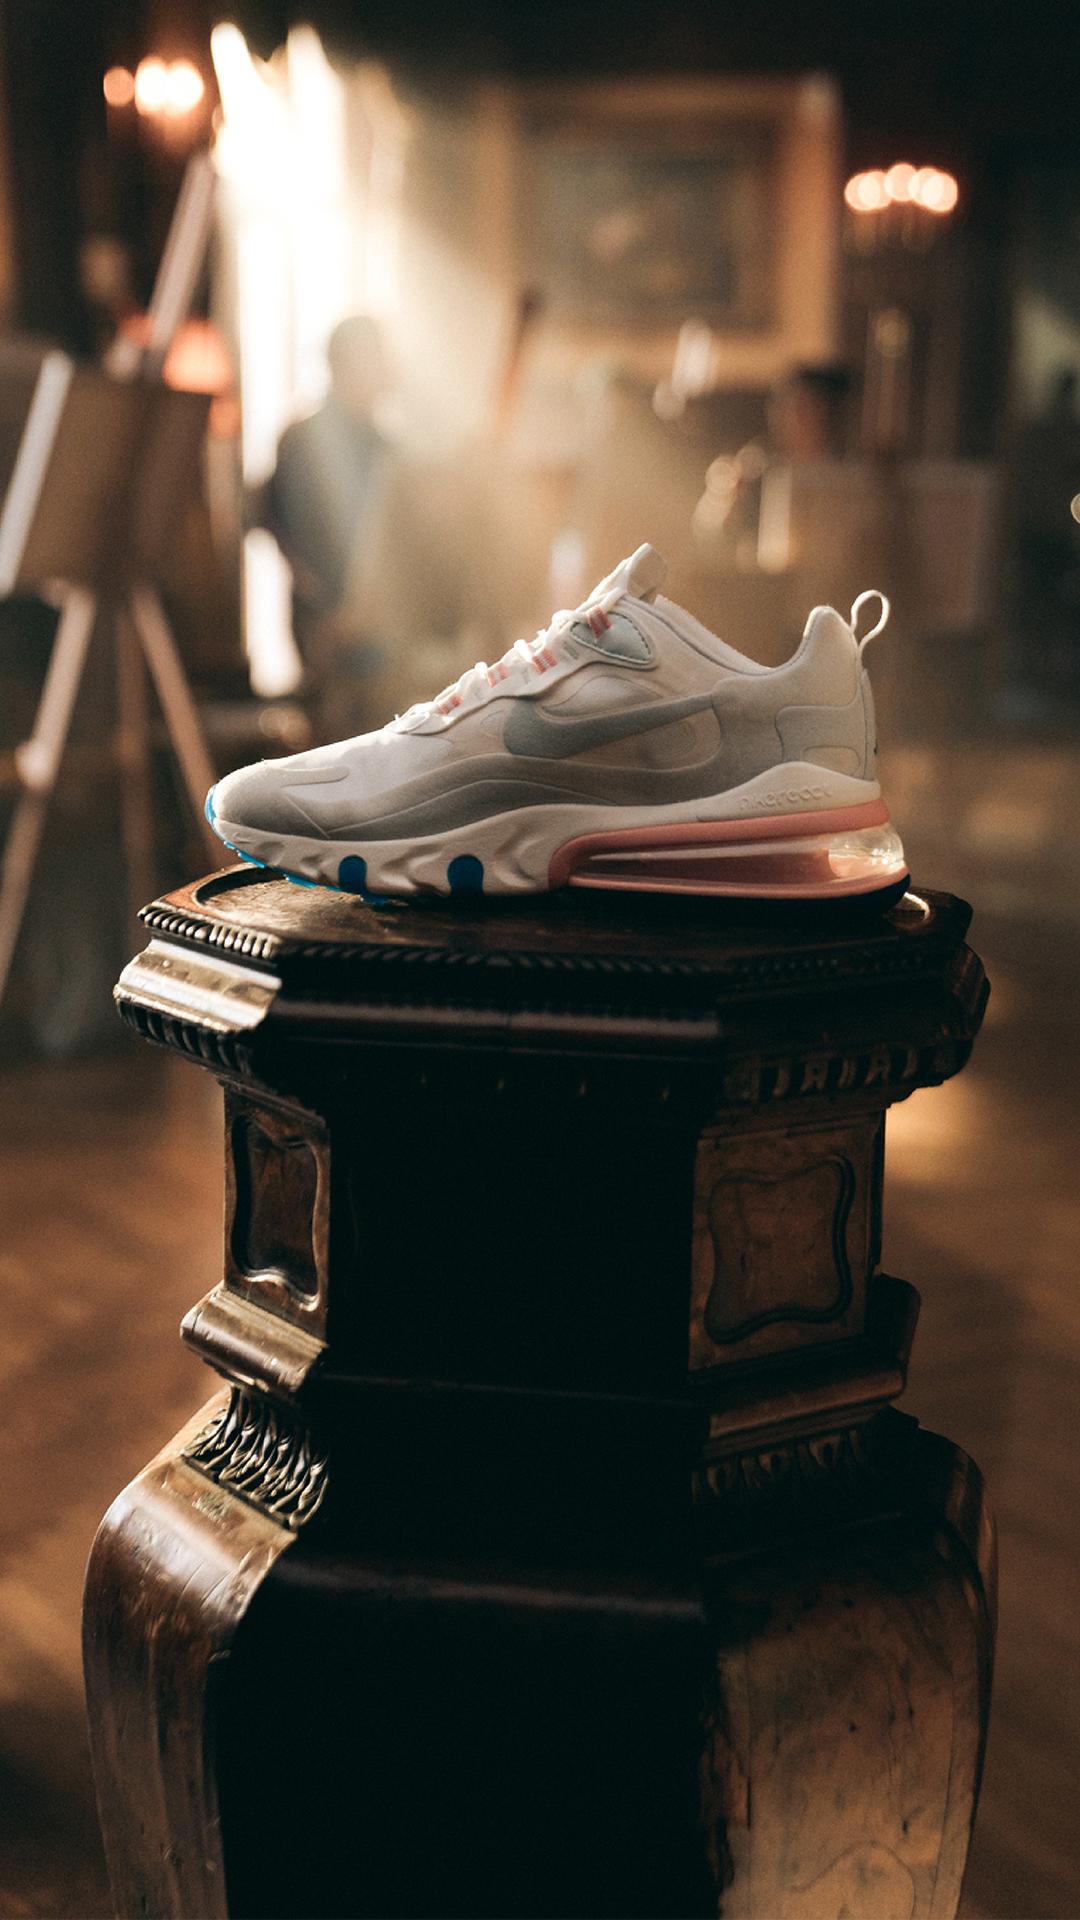 Sneaker_Life_6 copy_under20mb.jpg